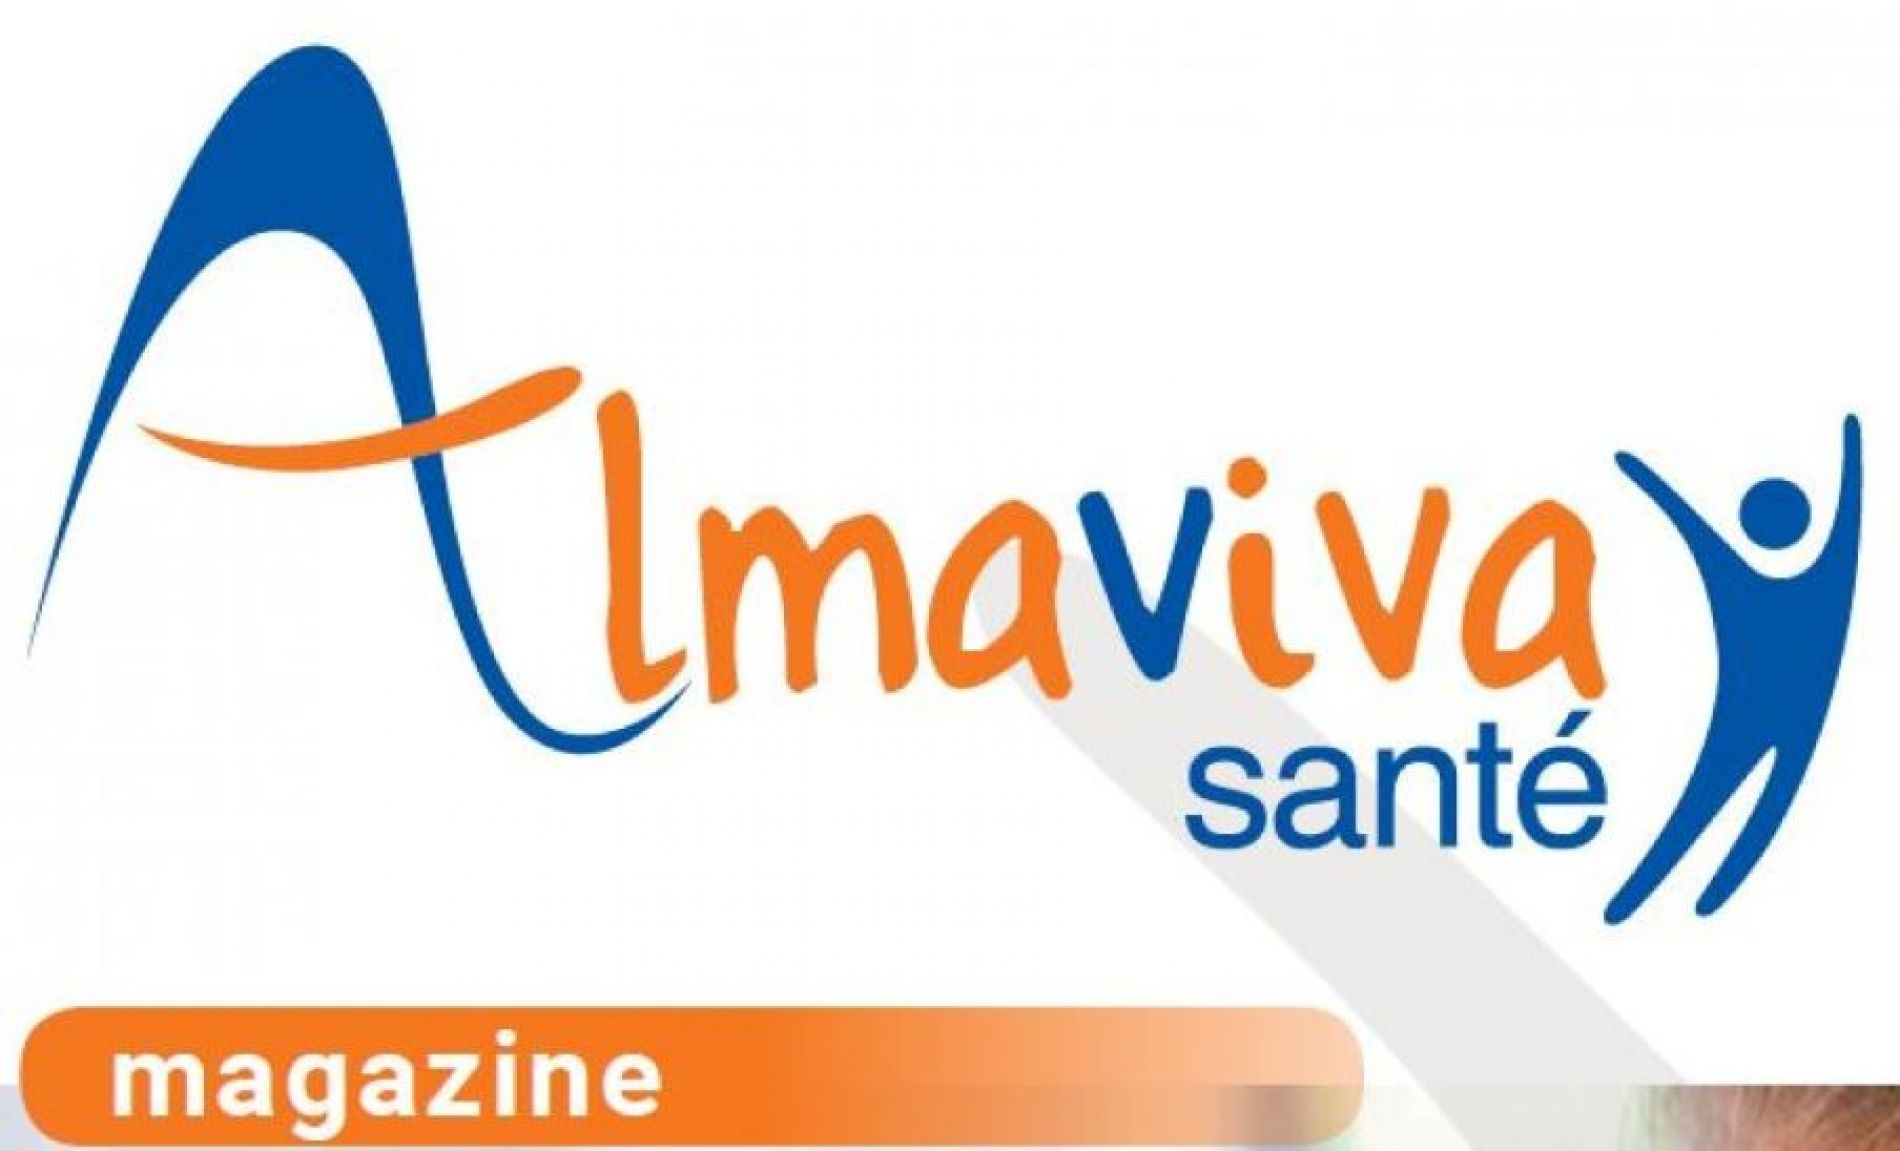 Magazine ALMAVIVA Santé N°6